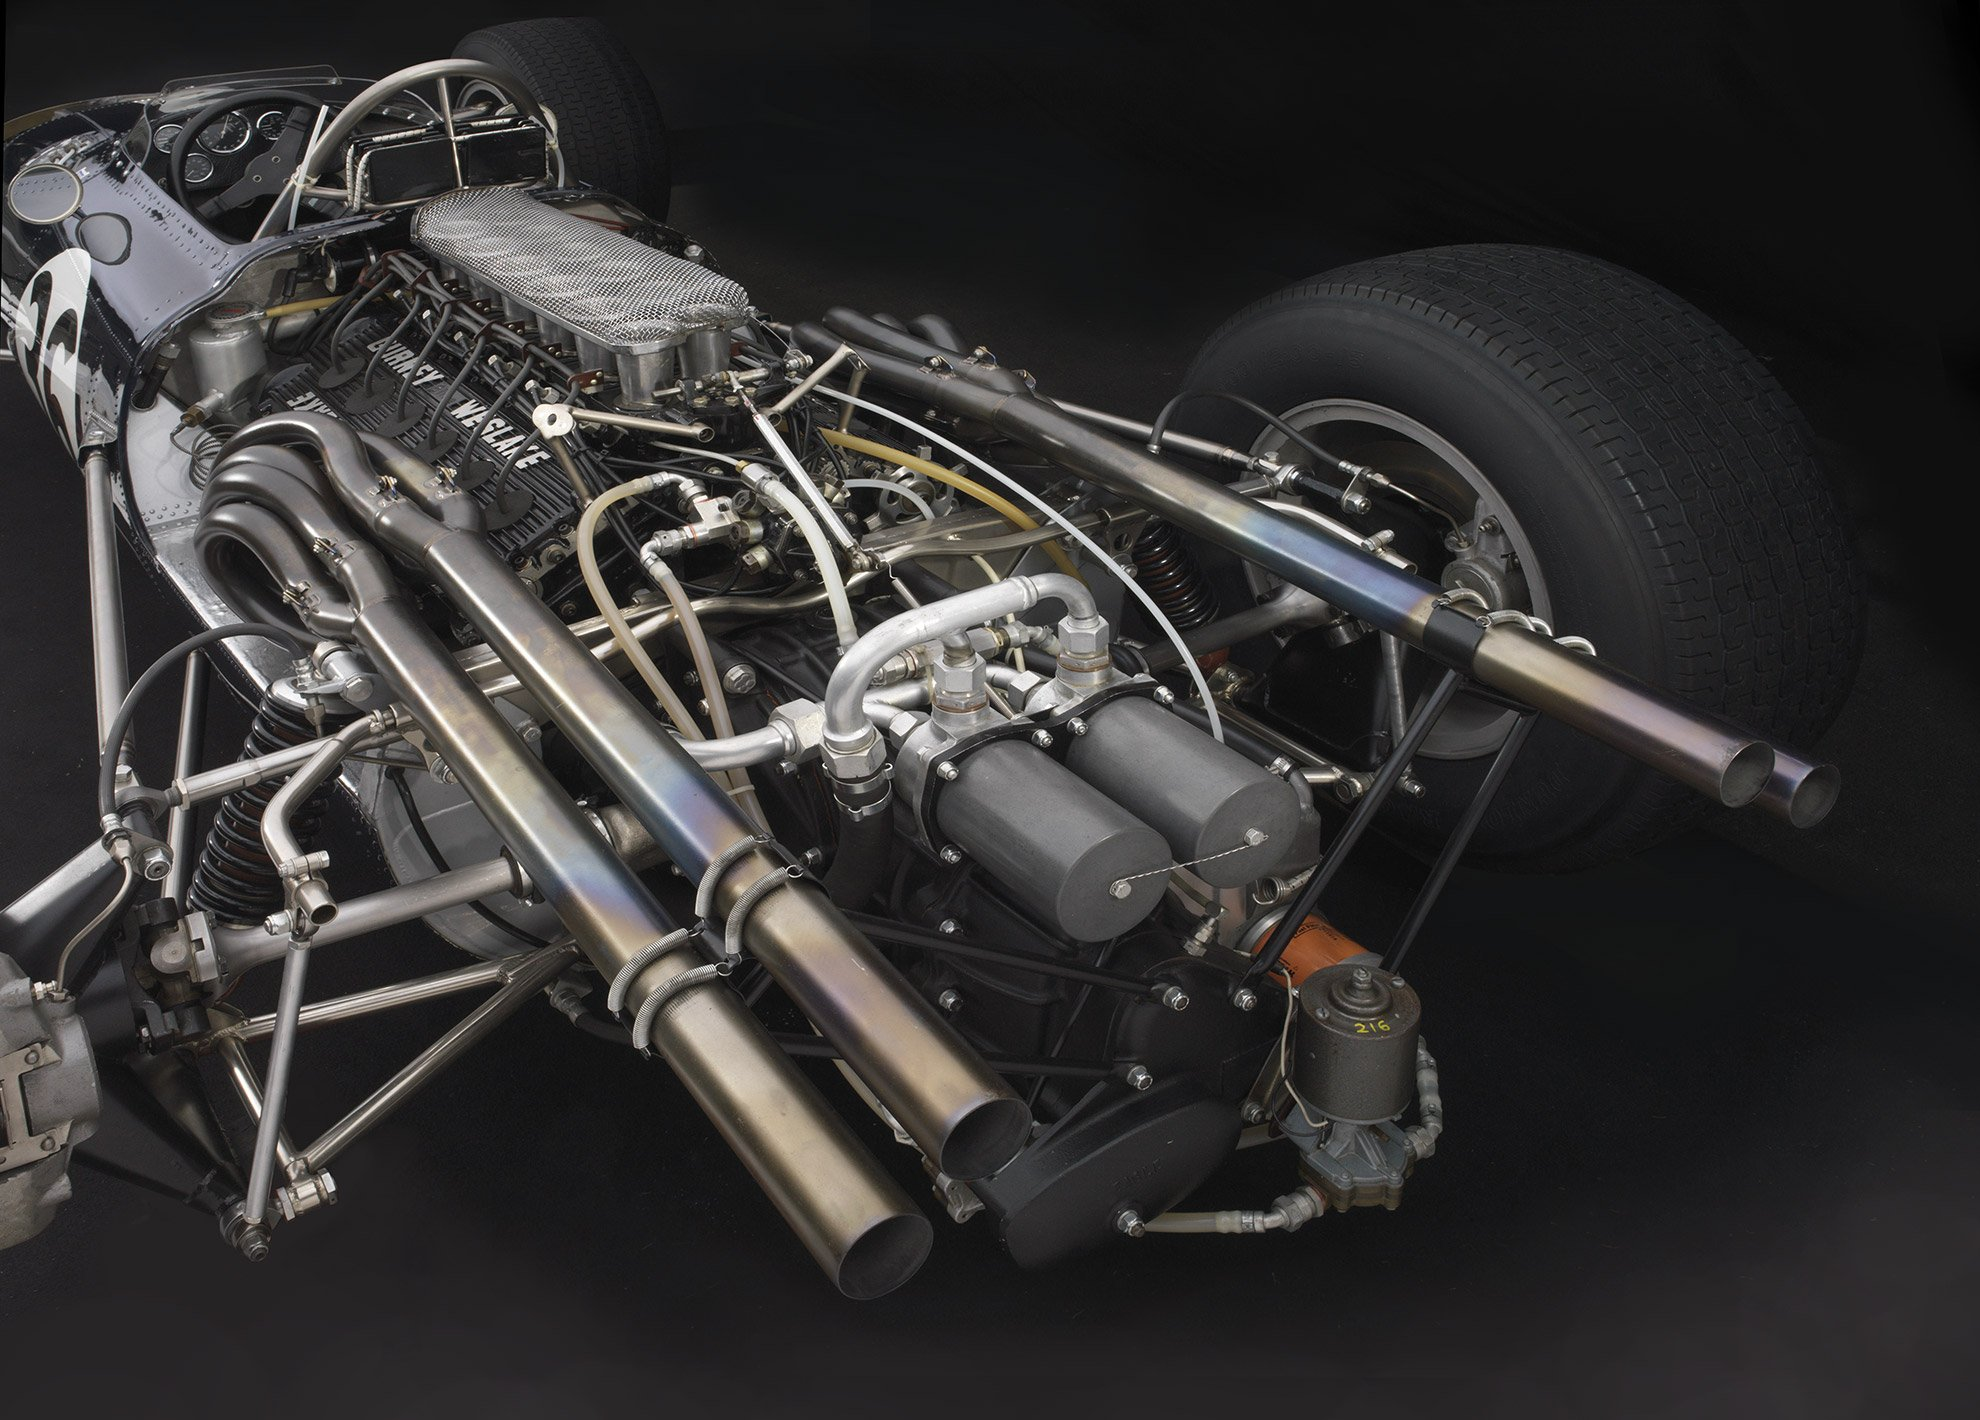 1966_Eagle_T1G__Mk1__F_1_formula_race_racing_1980x1420.jpg